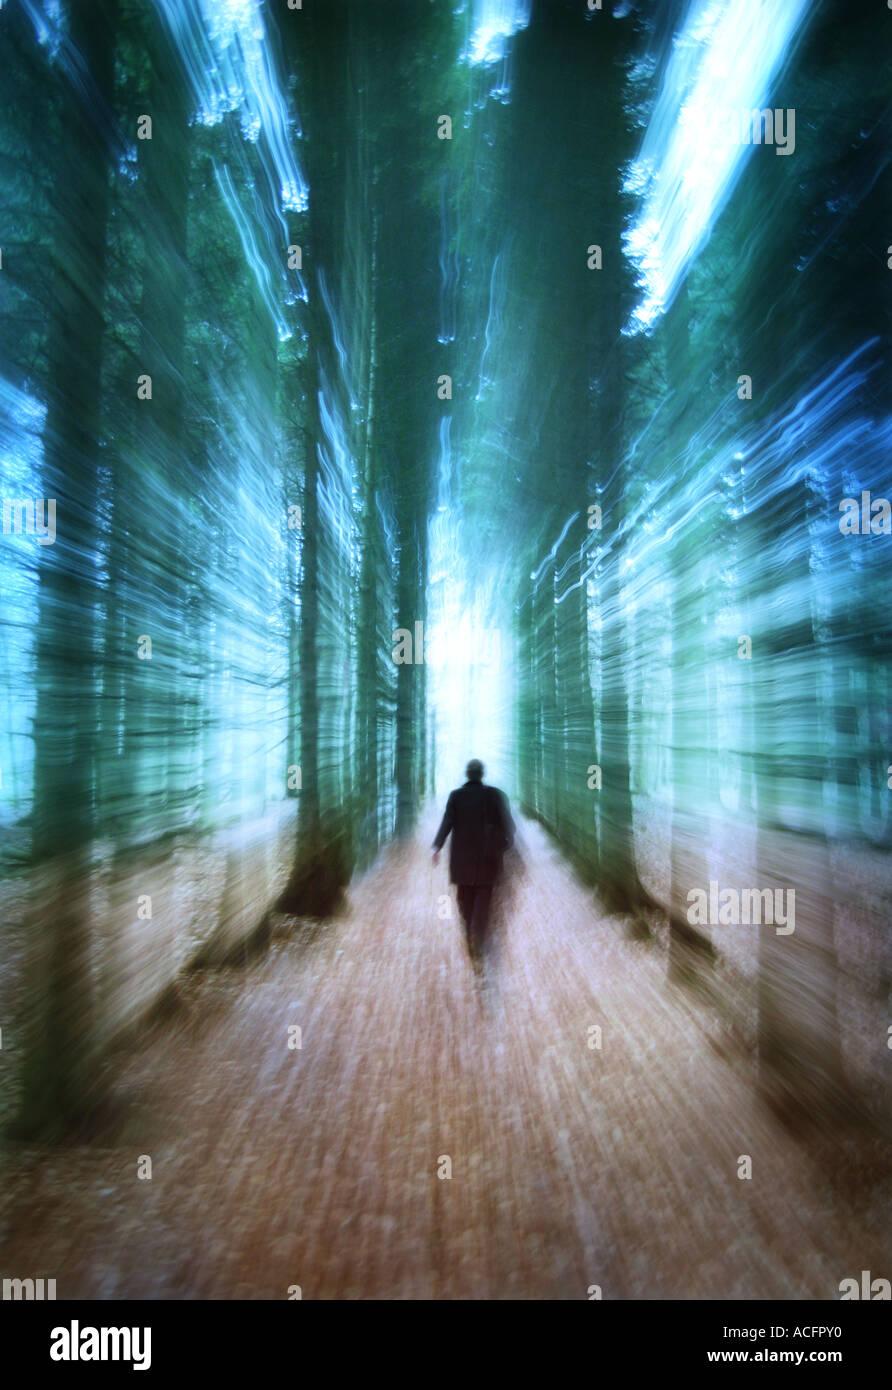 photo of a man walking through trees - Stock Image